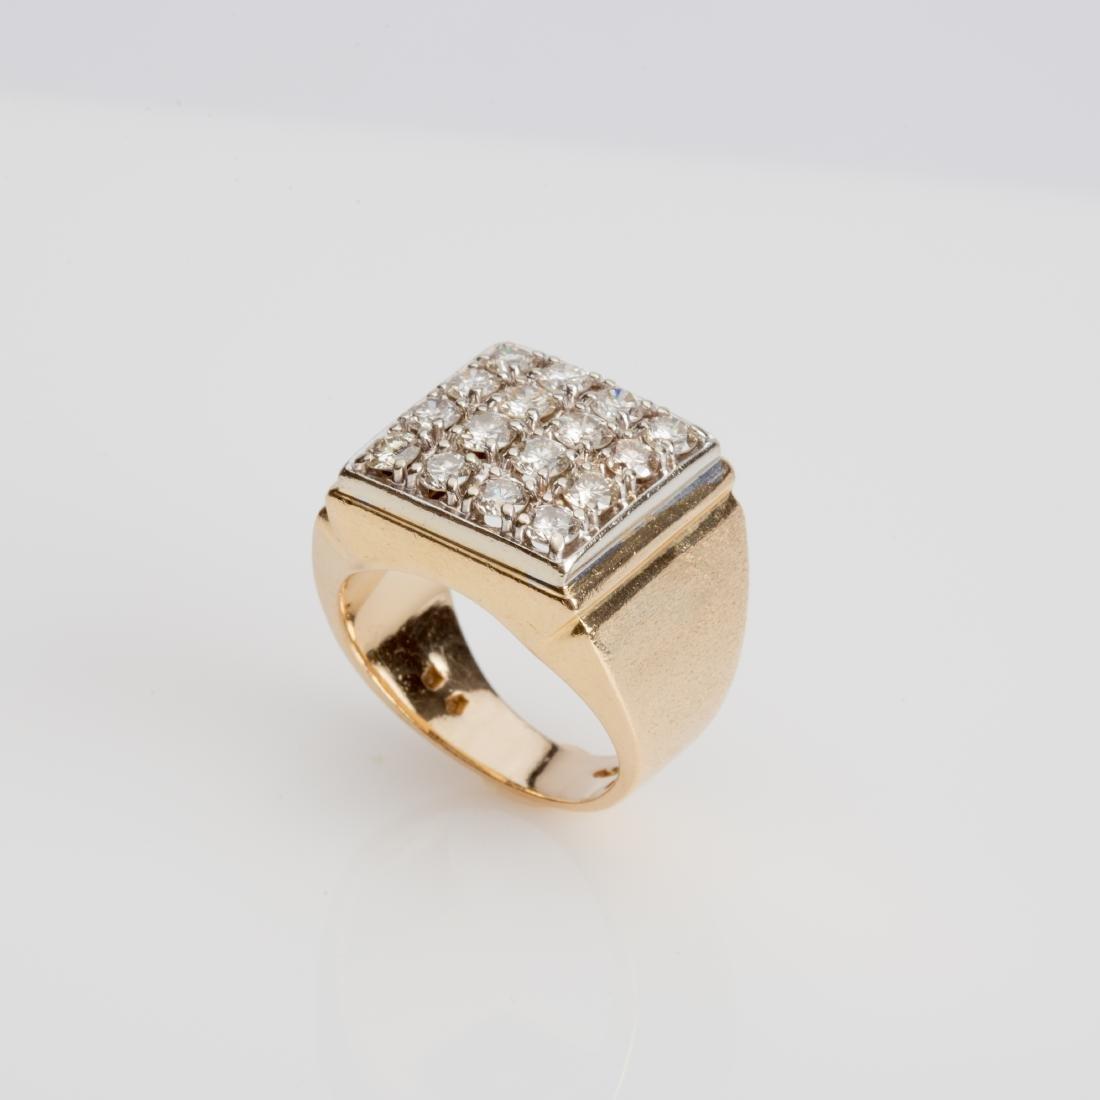 14K MENS SQUARE TOP DIAMOND RING SIZE 8.75